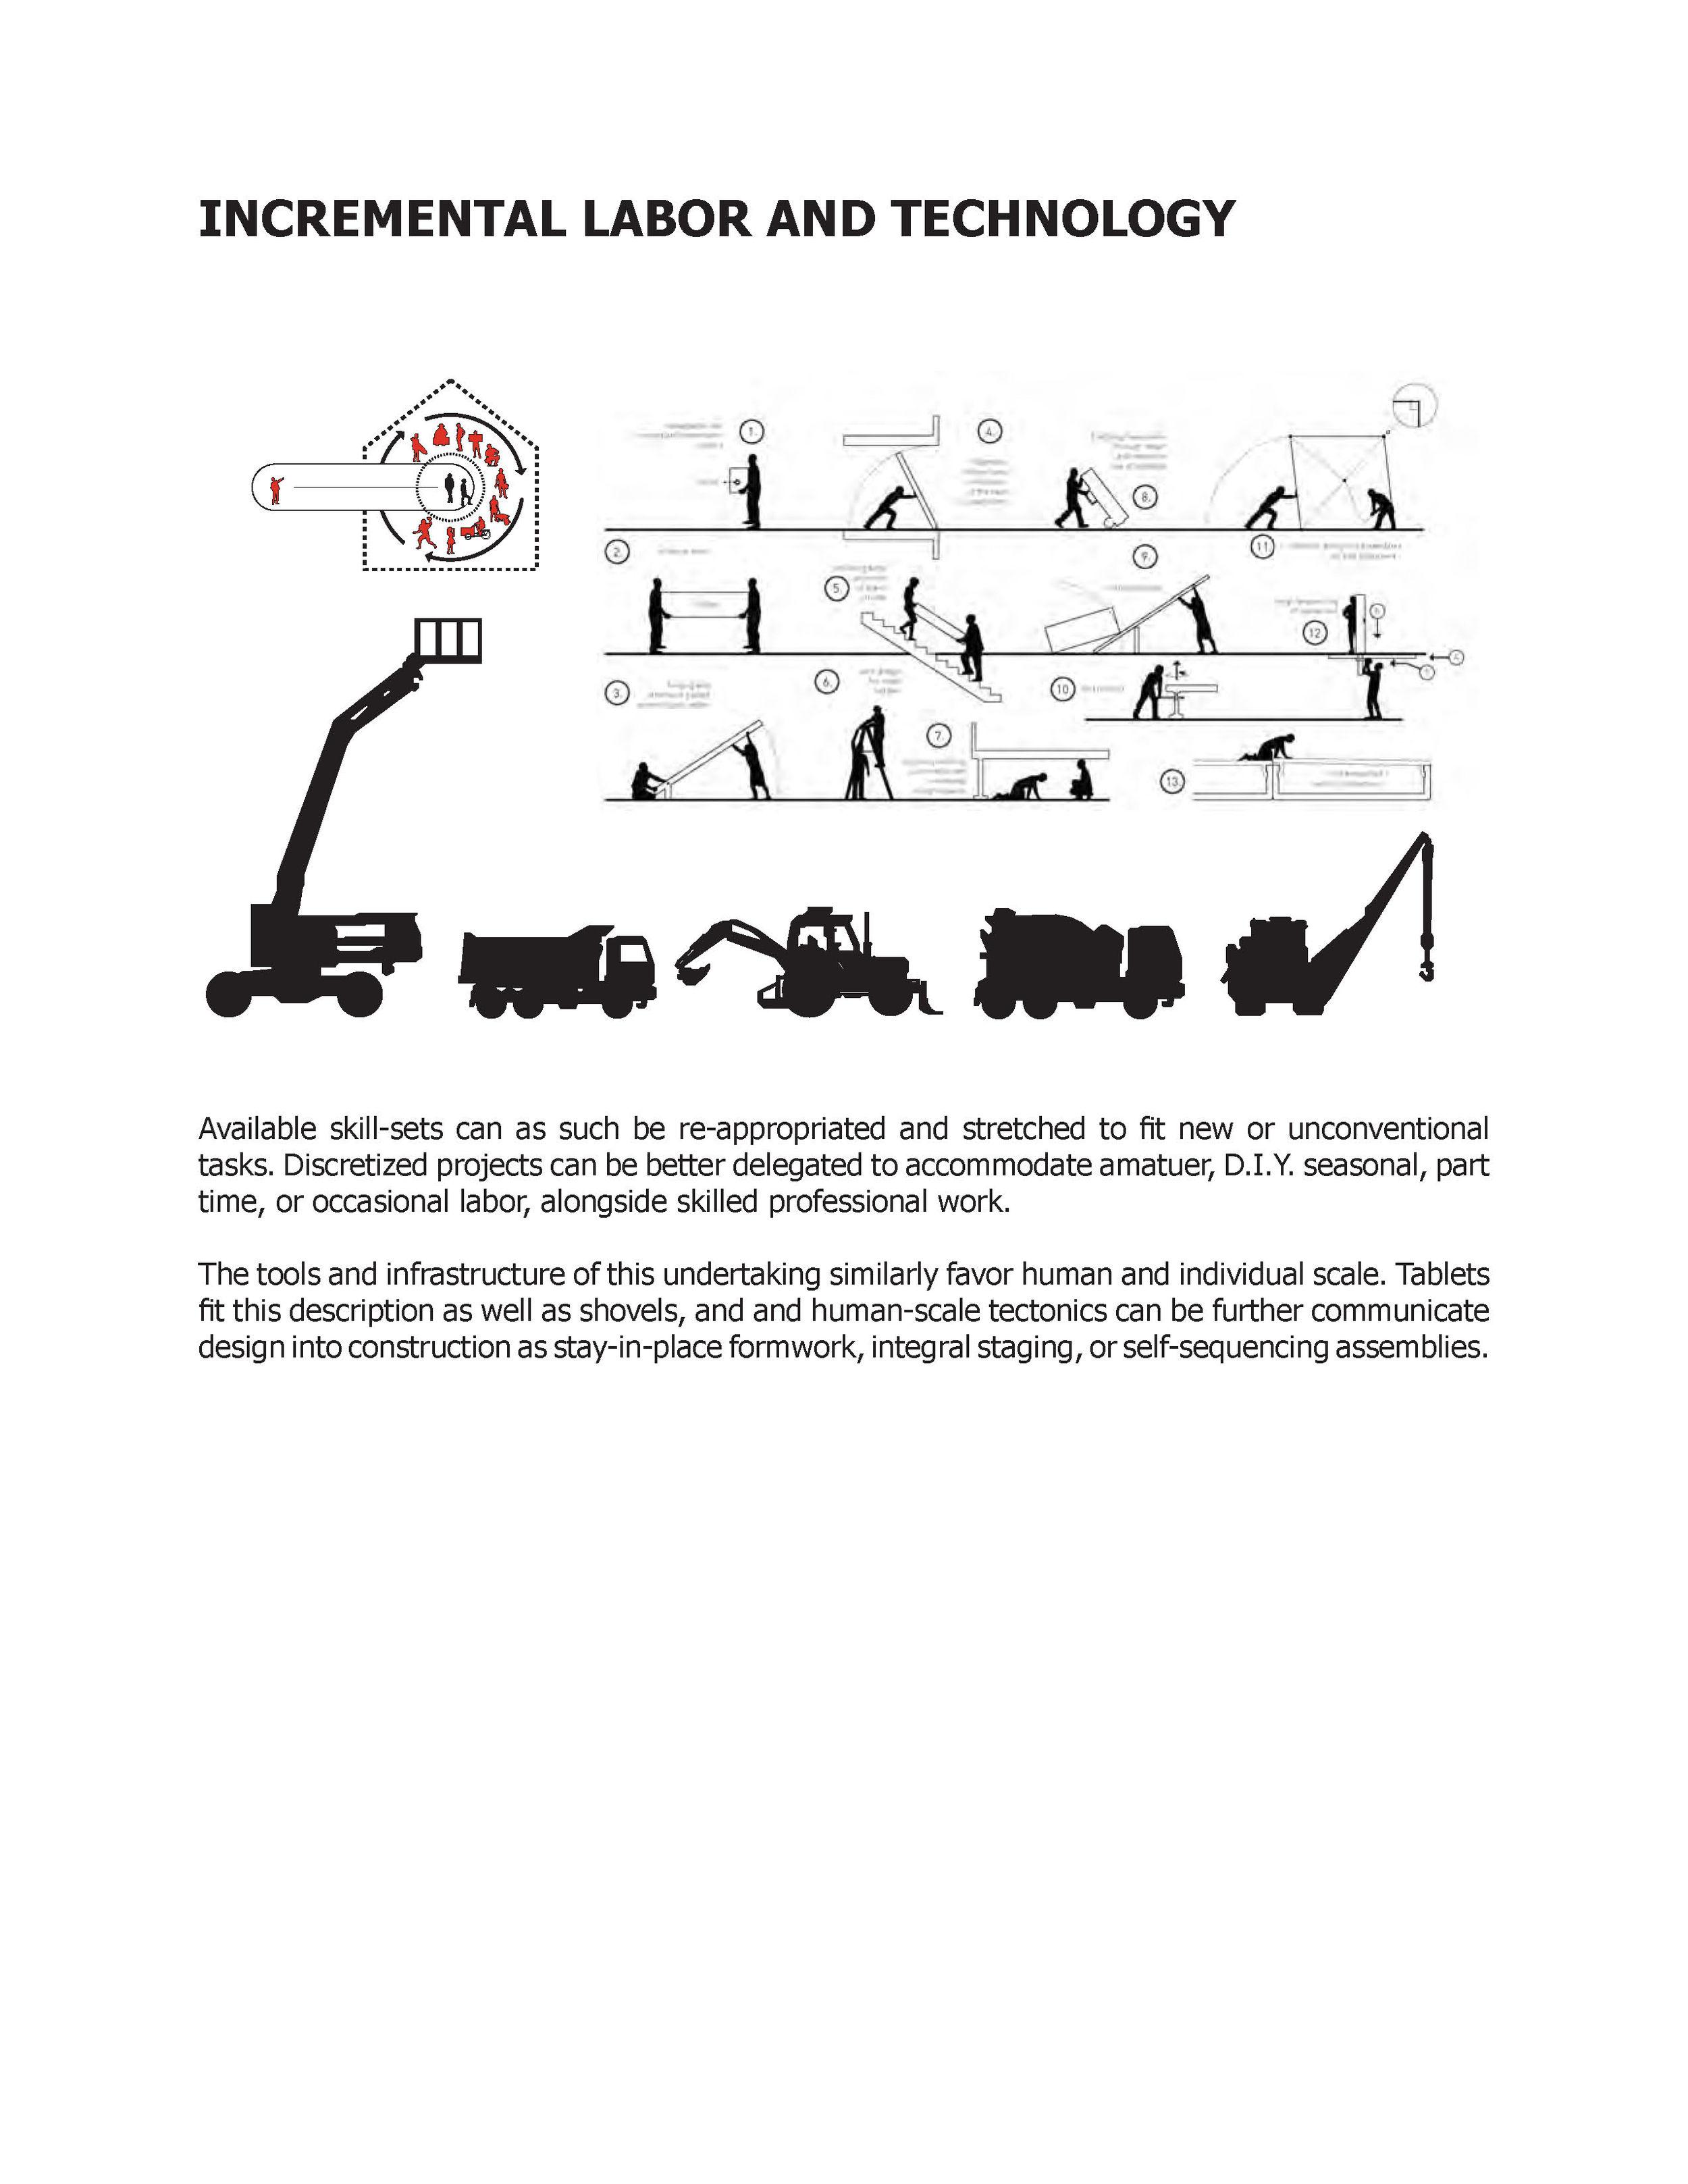 DSA_CMiller_Thesis_Slides_Boards_03_30_2013_Page_09.jpg